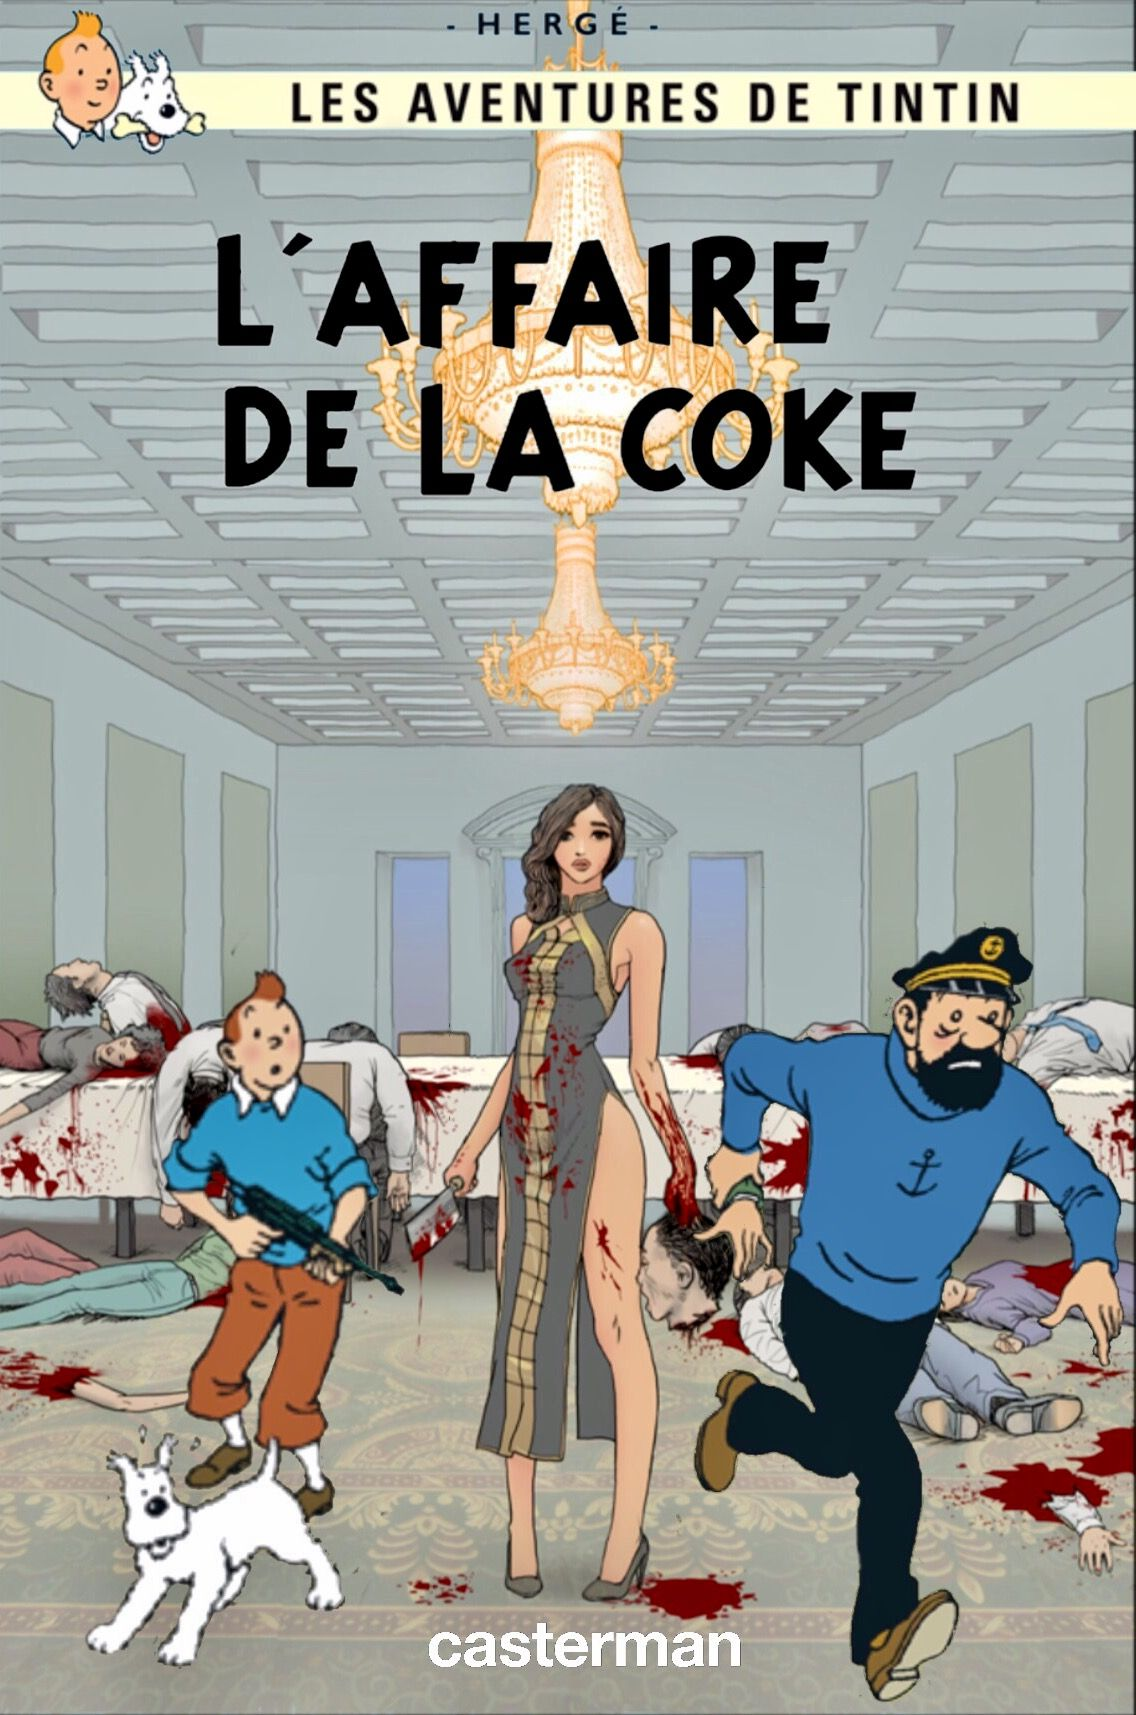 BD / Aventure. Les Archives Tintin Tintin (Éditions du Petit Vingtième) Tintin (Éditions Moulinsart) Tintin (France Loisirs - album double) Tintin (L'œuvre intégrale d'Hergé - Rombaldi) Tintin (Pop-Hop) Tintin en noir et blanc (Coffret).